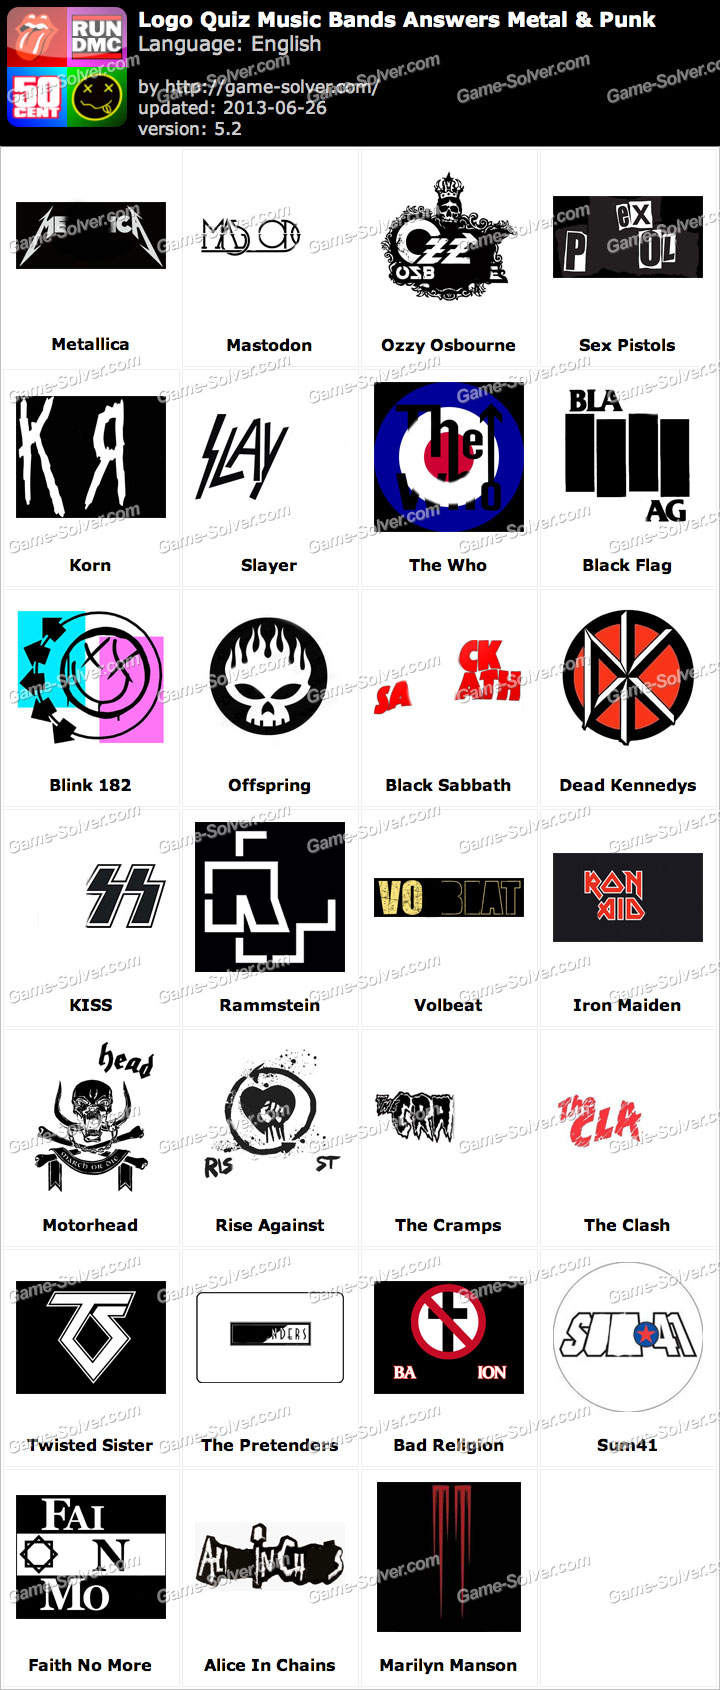 Logo Quiz Music Bands Answers Metal & Punk.